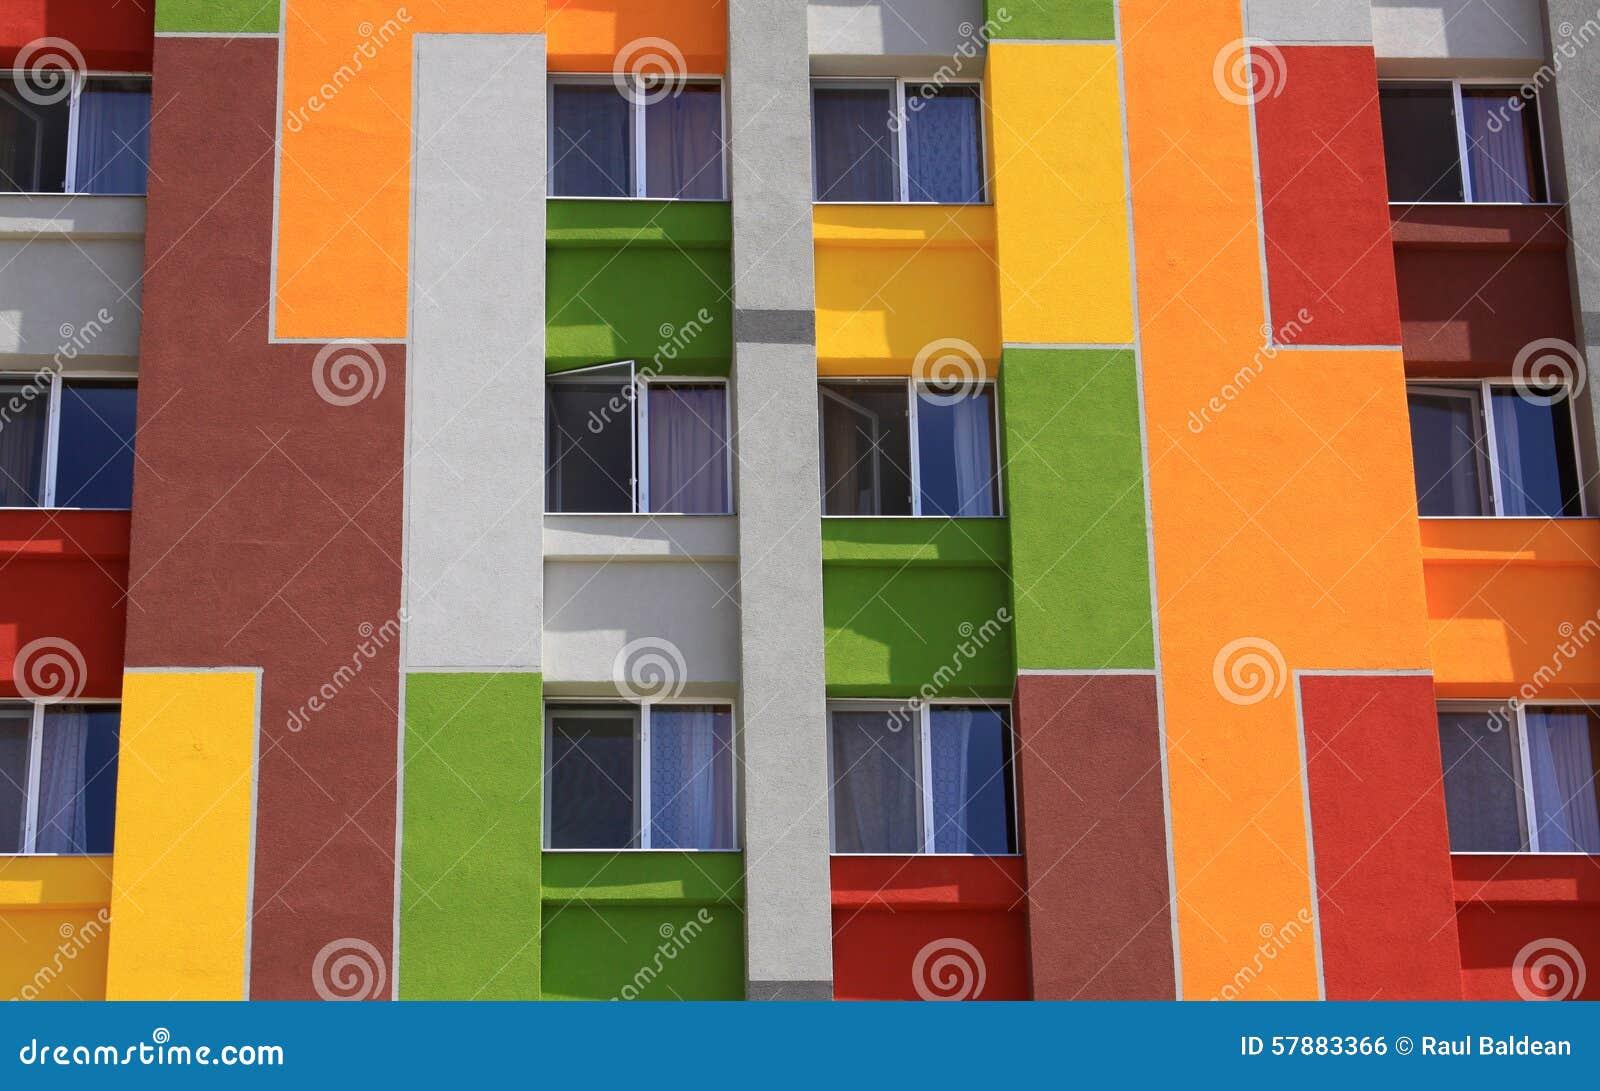 Colored facade of an apartment building